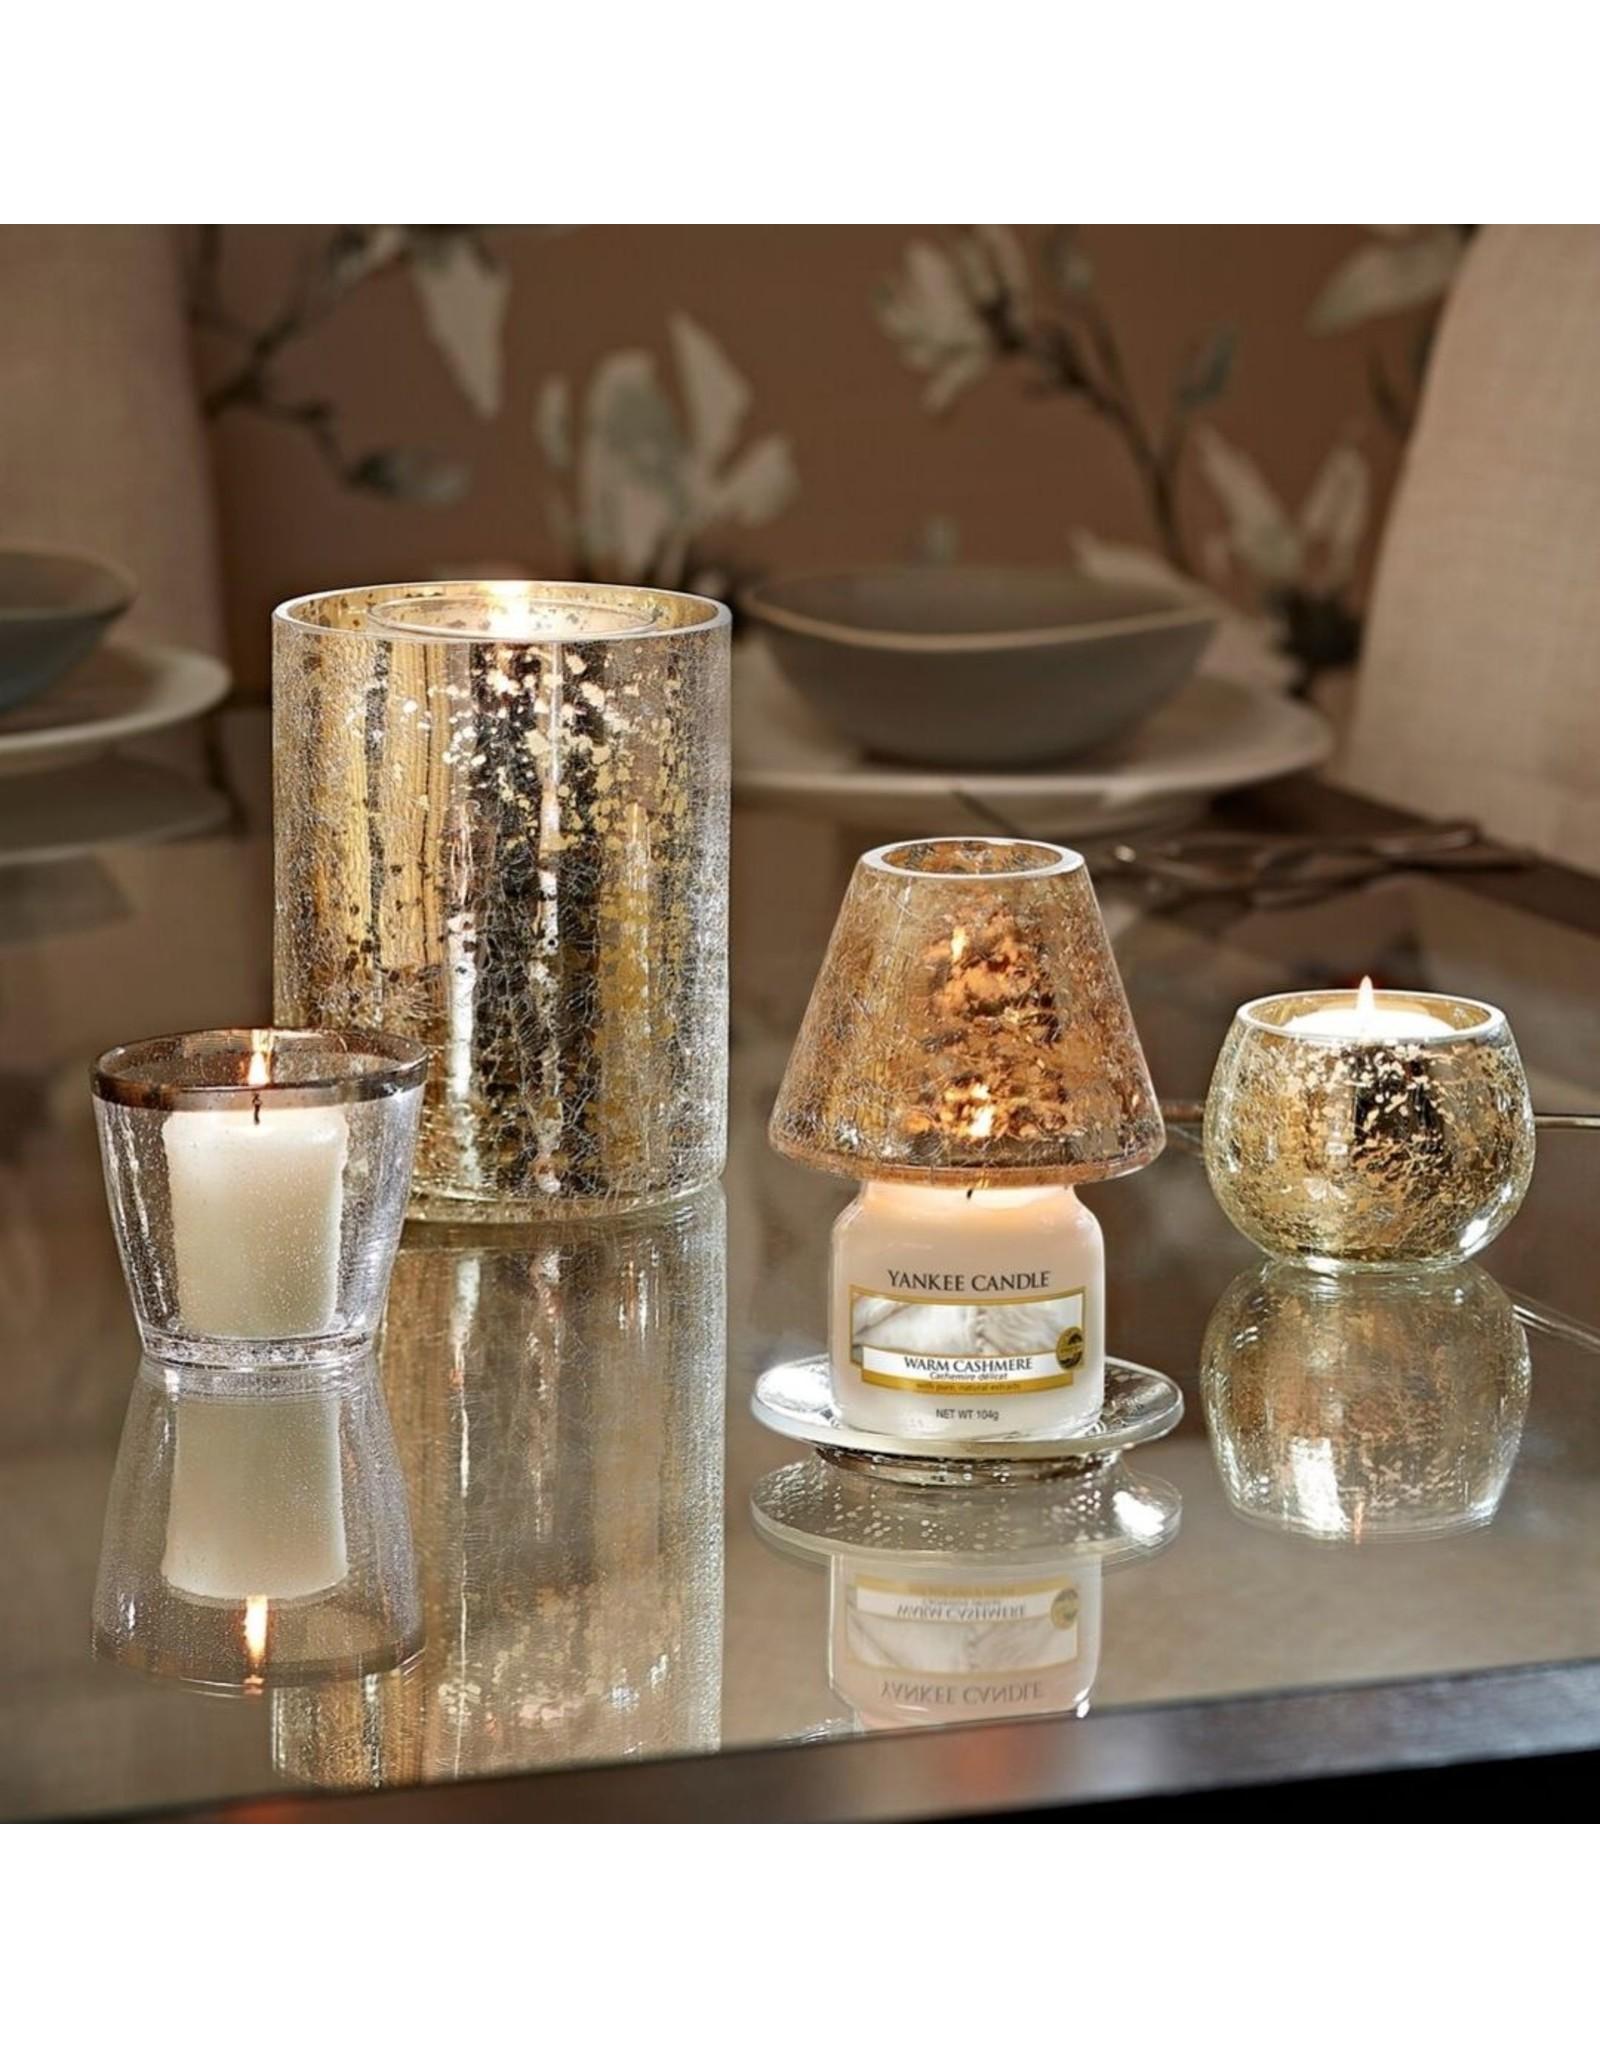 Yankee Candle Kensington - Jar Holder